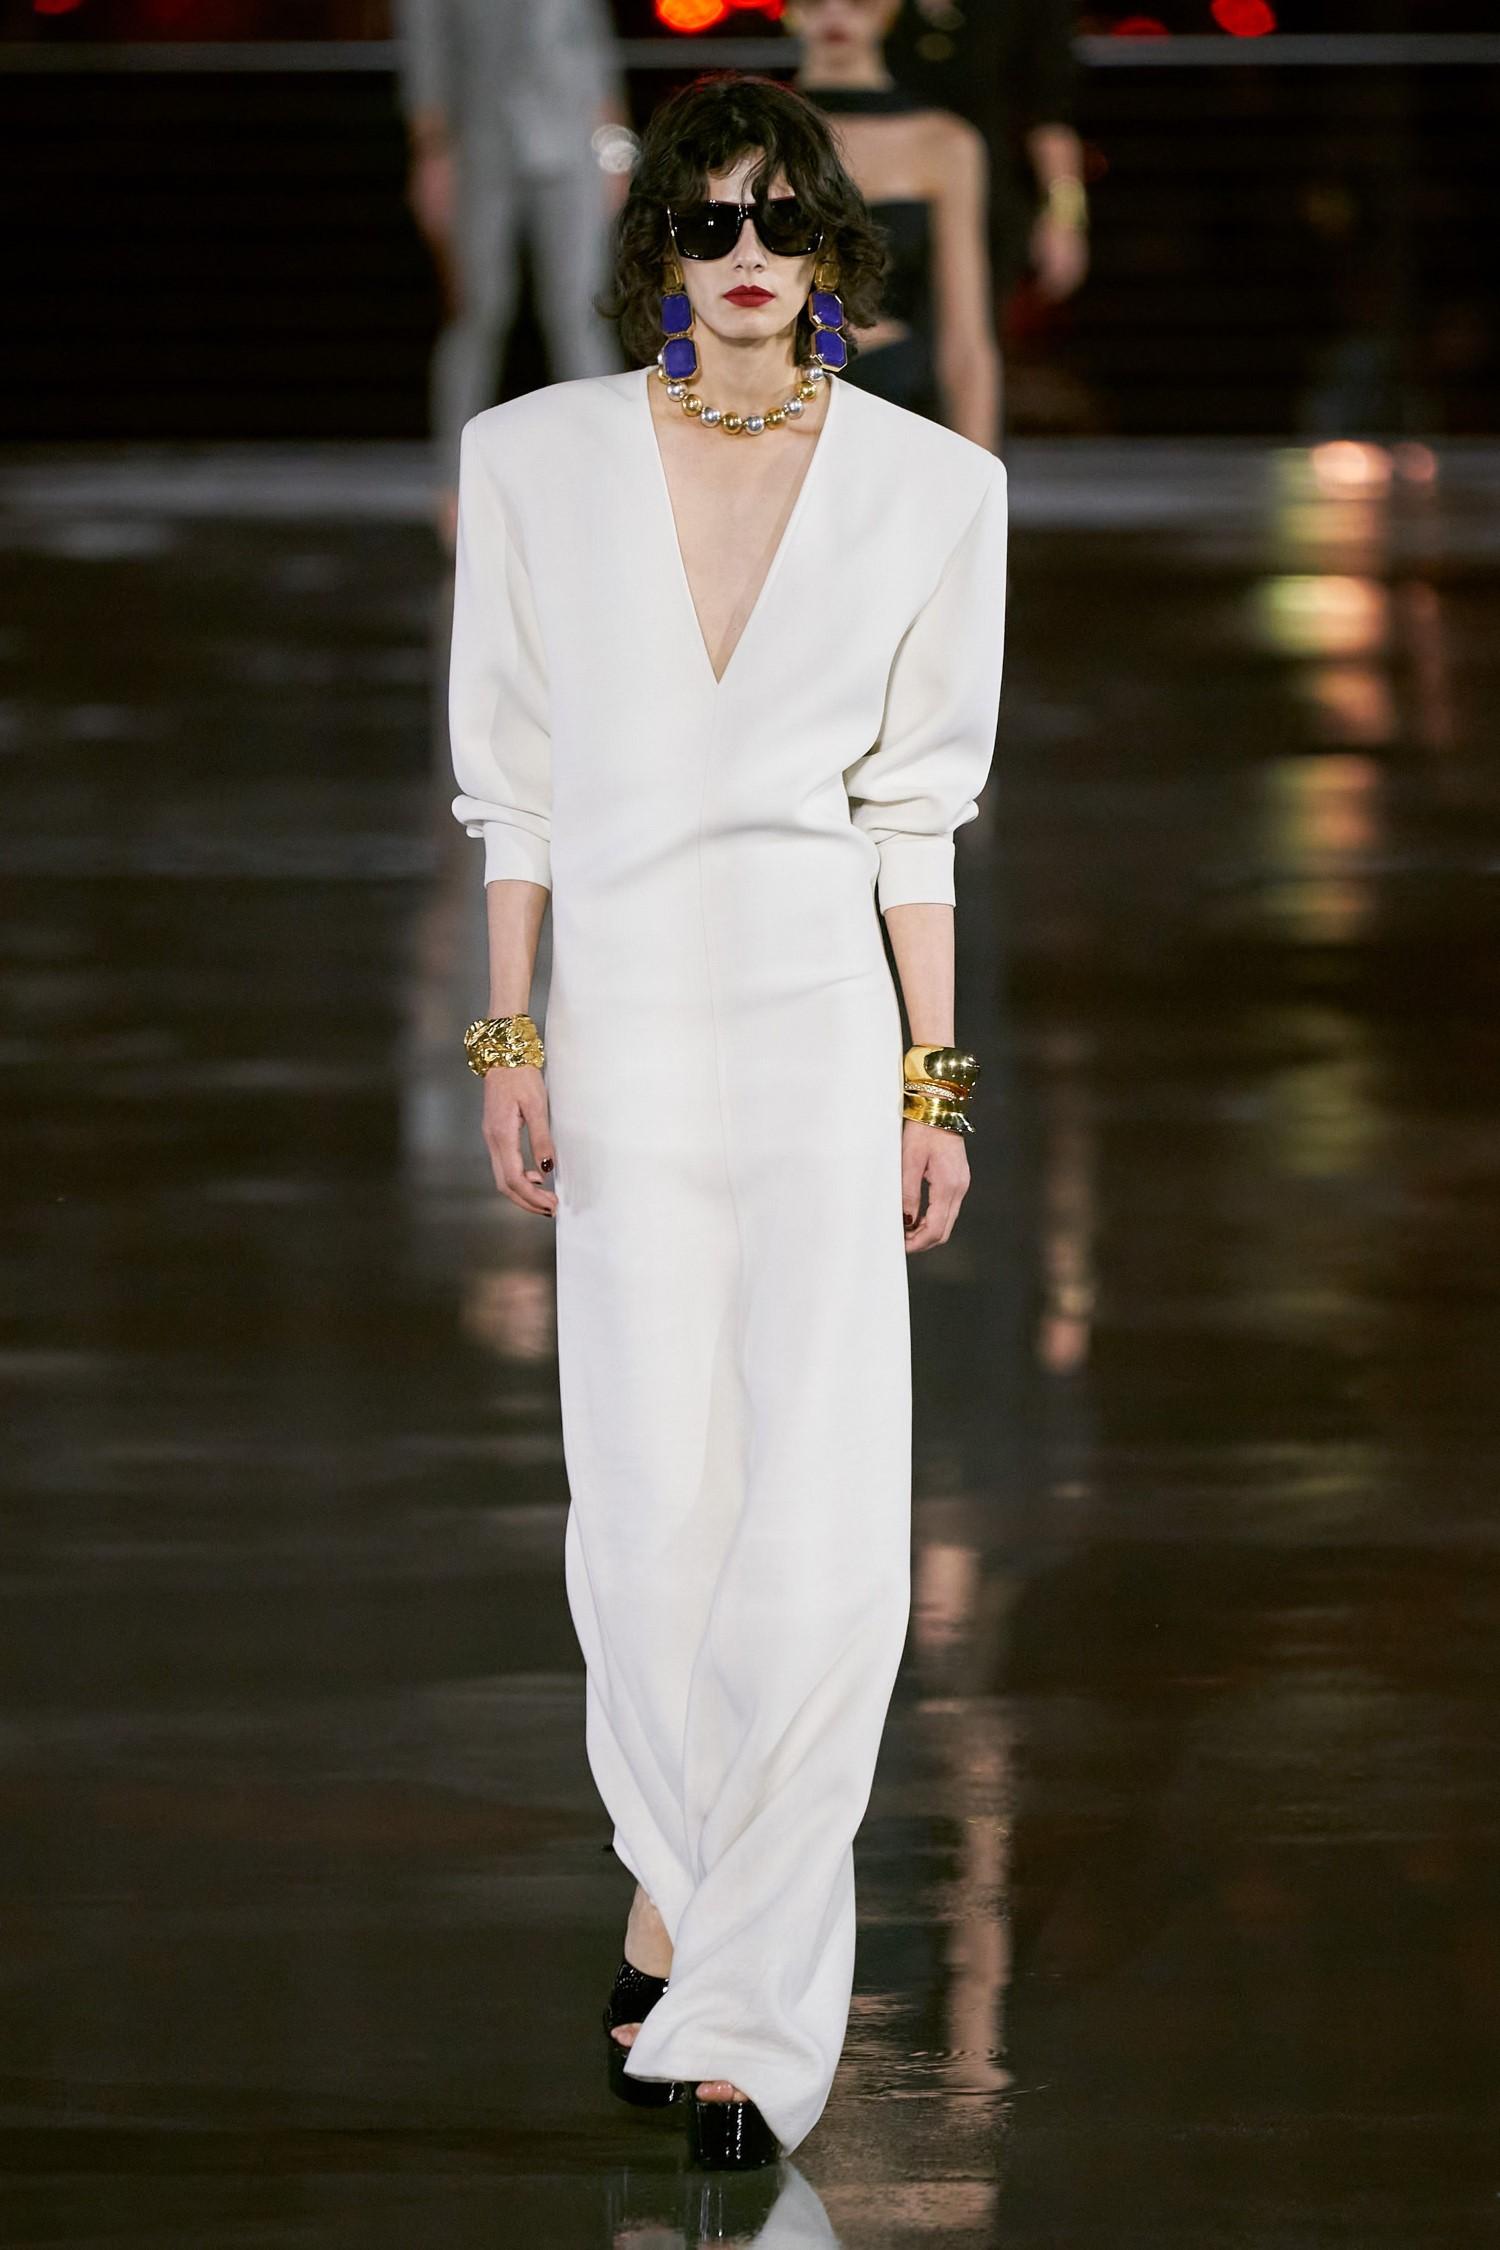 Saint Laurent Spring Summer 2022 - Paris Fashion Week